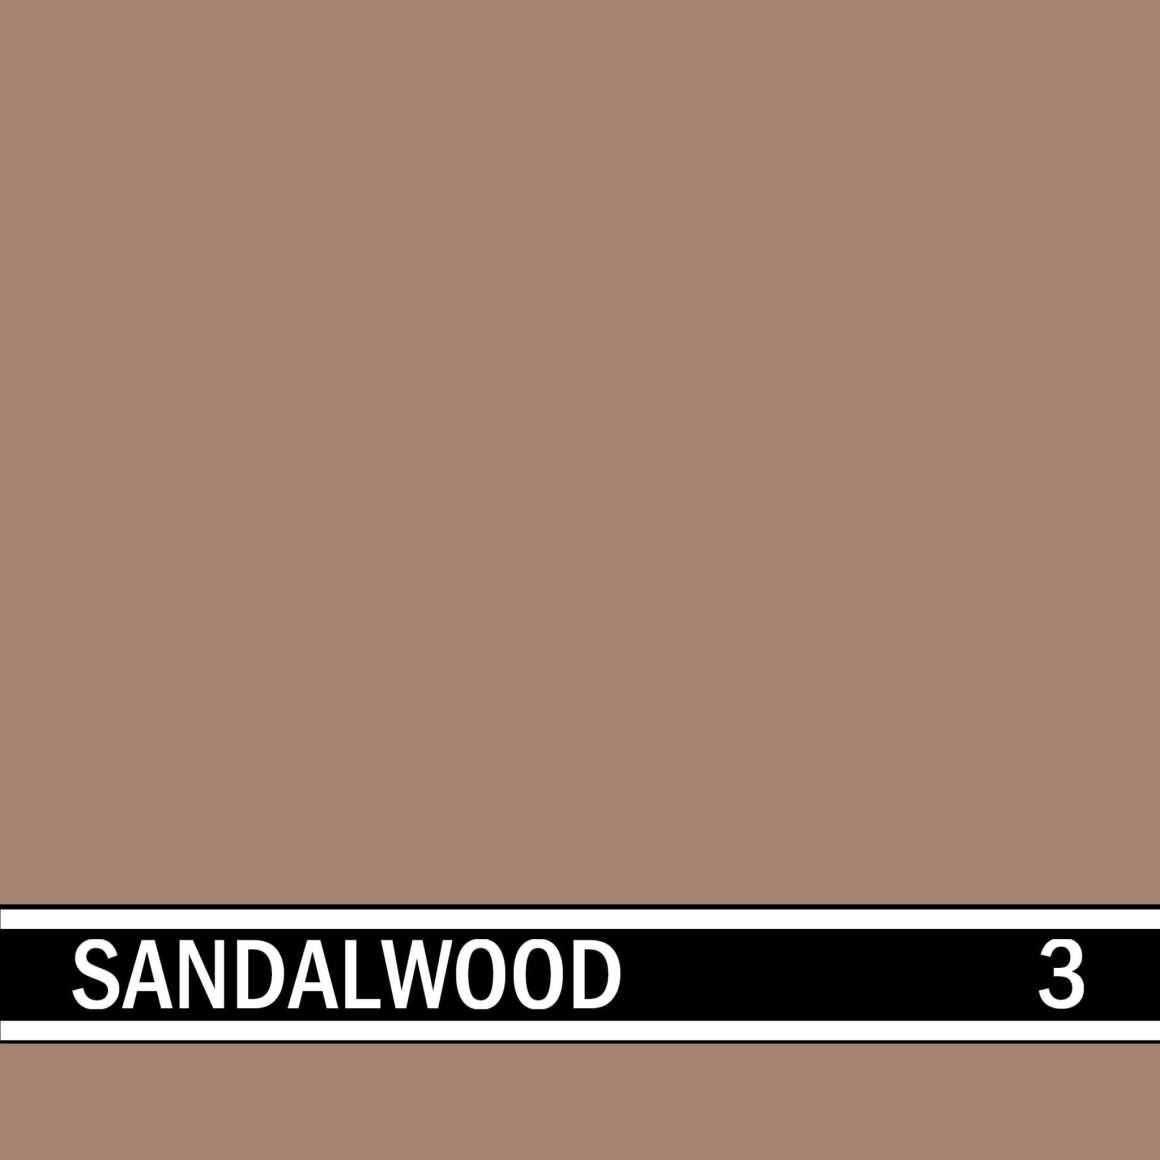 Sandalwood integral concrete color for stamped concrete and decorative colored concrete